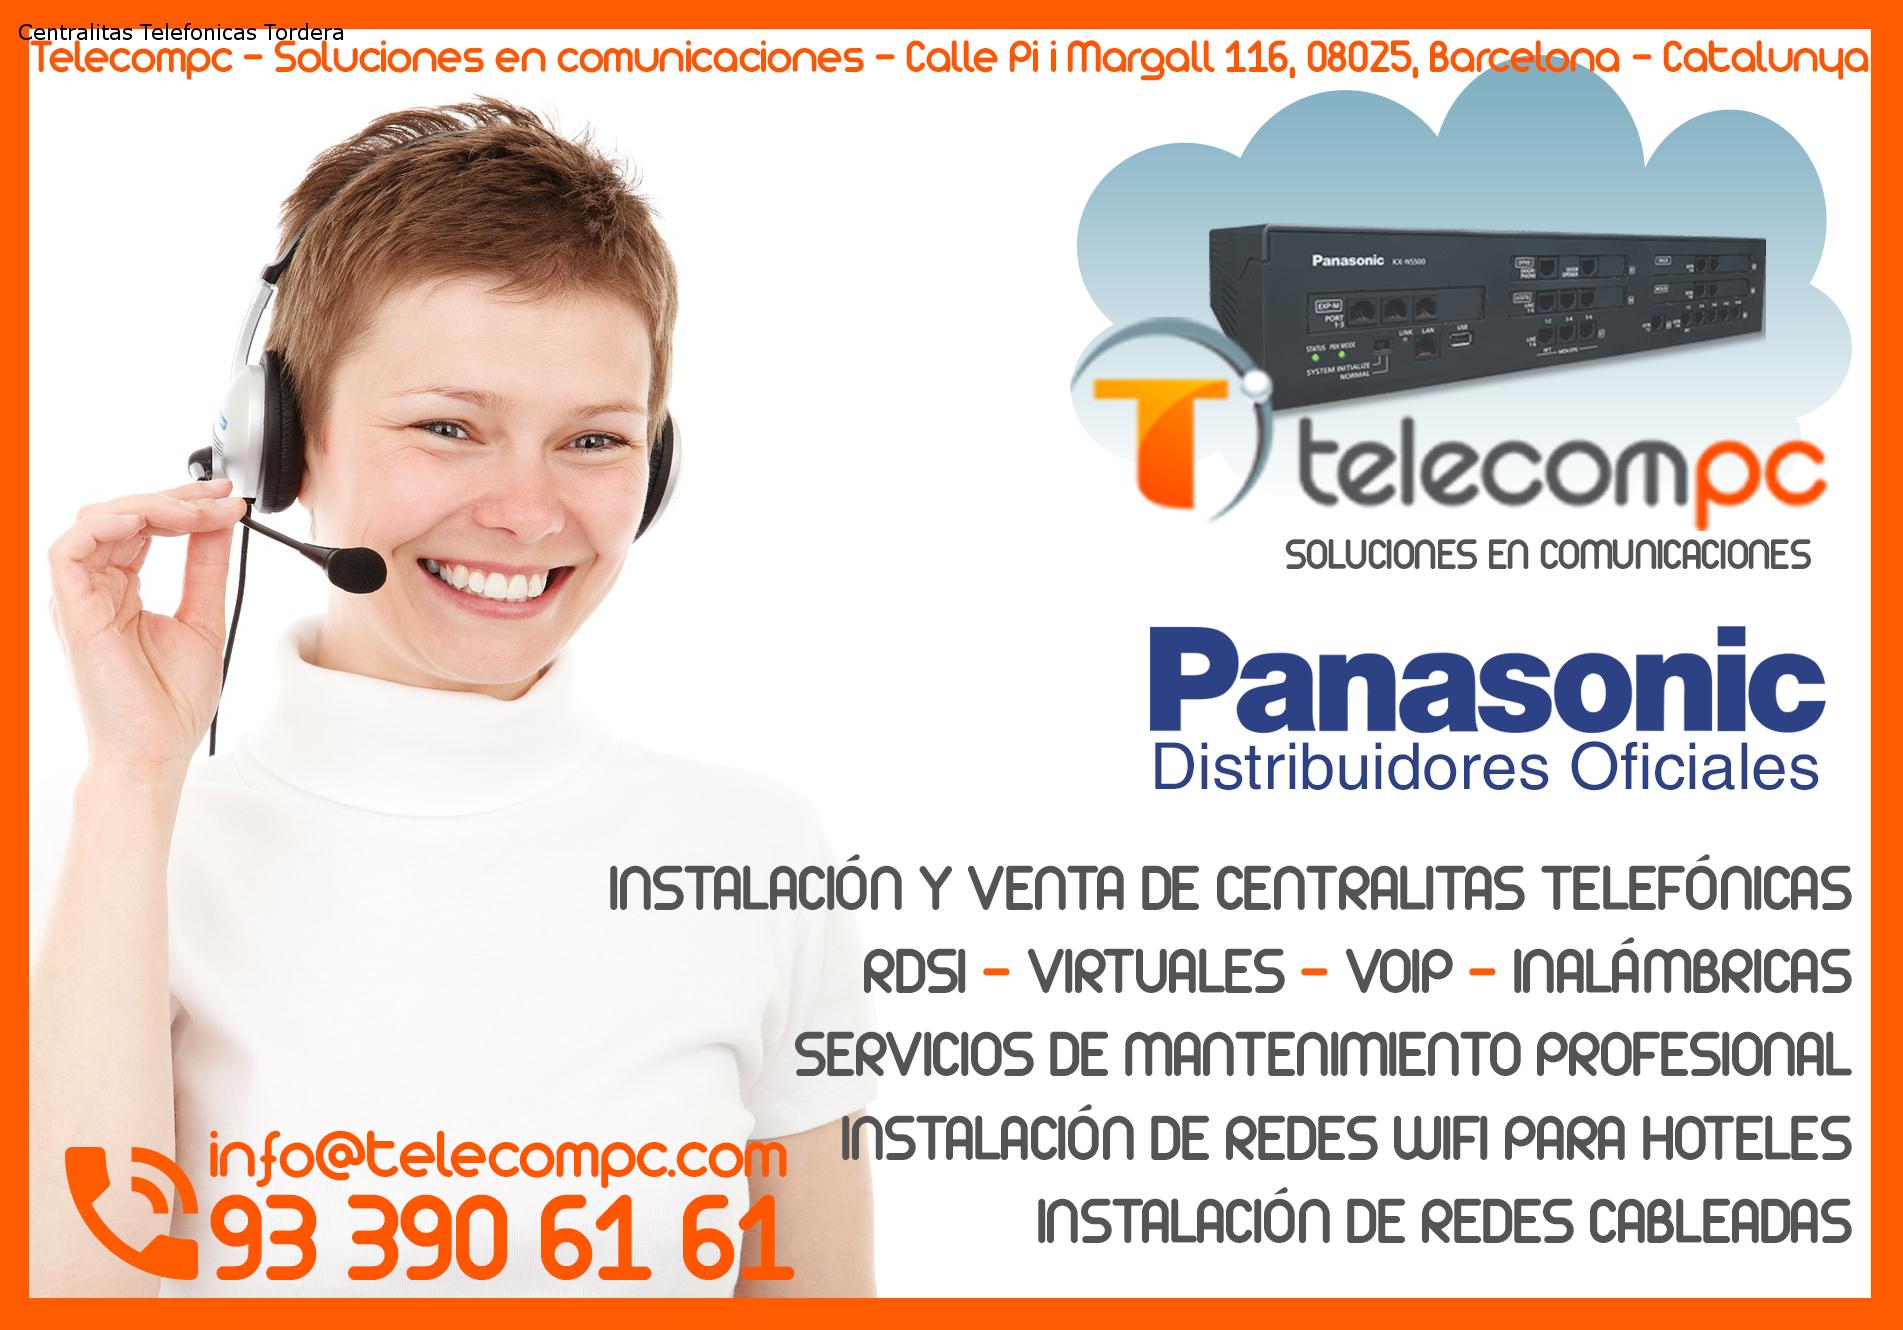 Centralitas Telefonicas Tordera